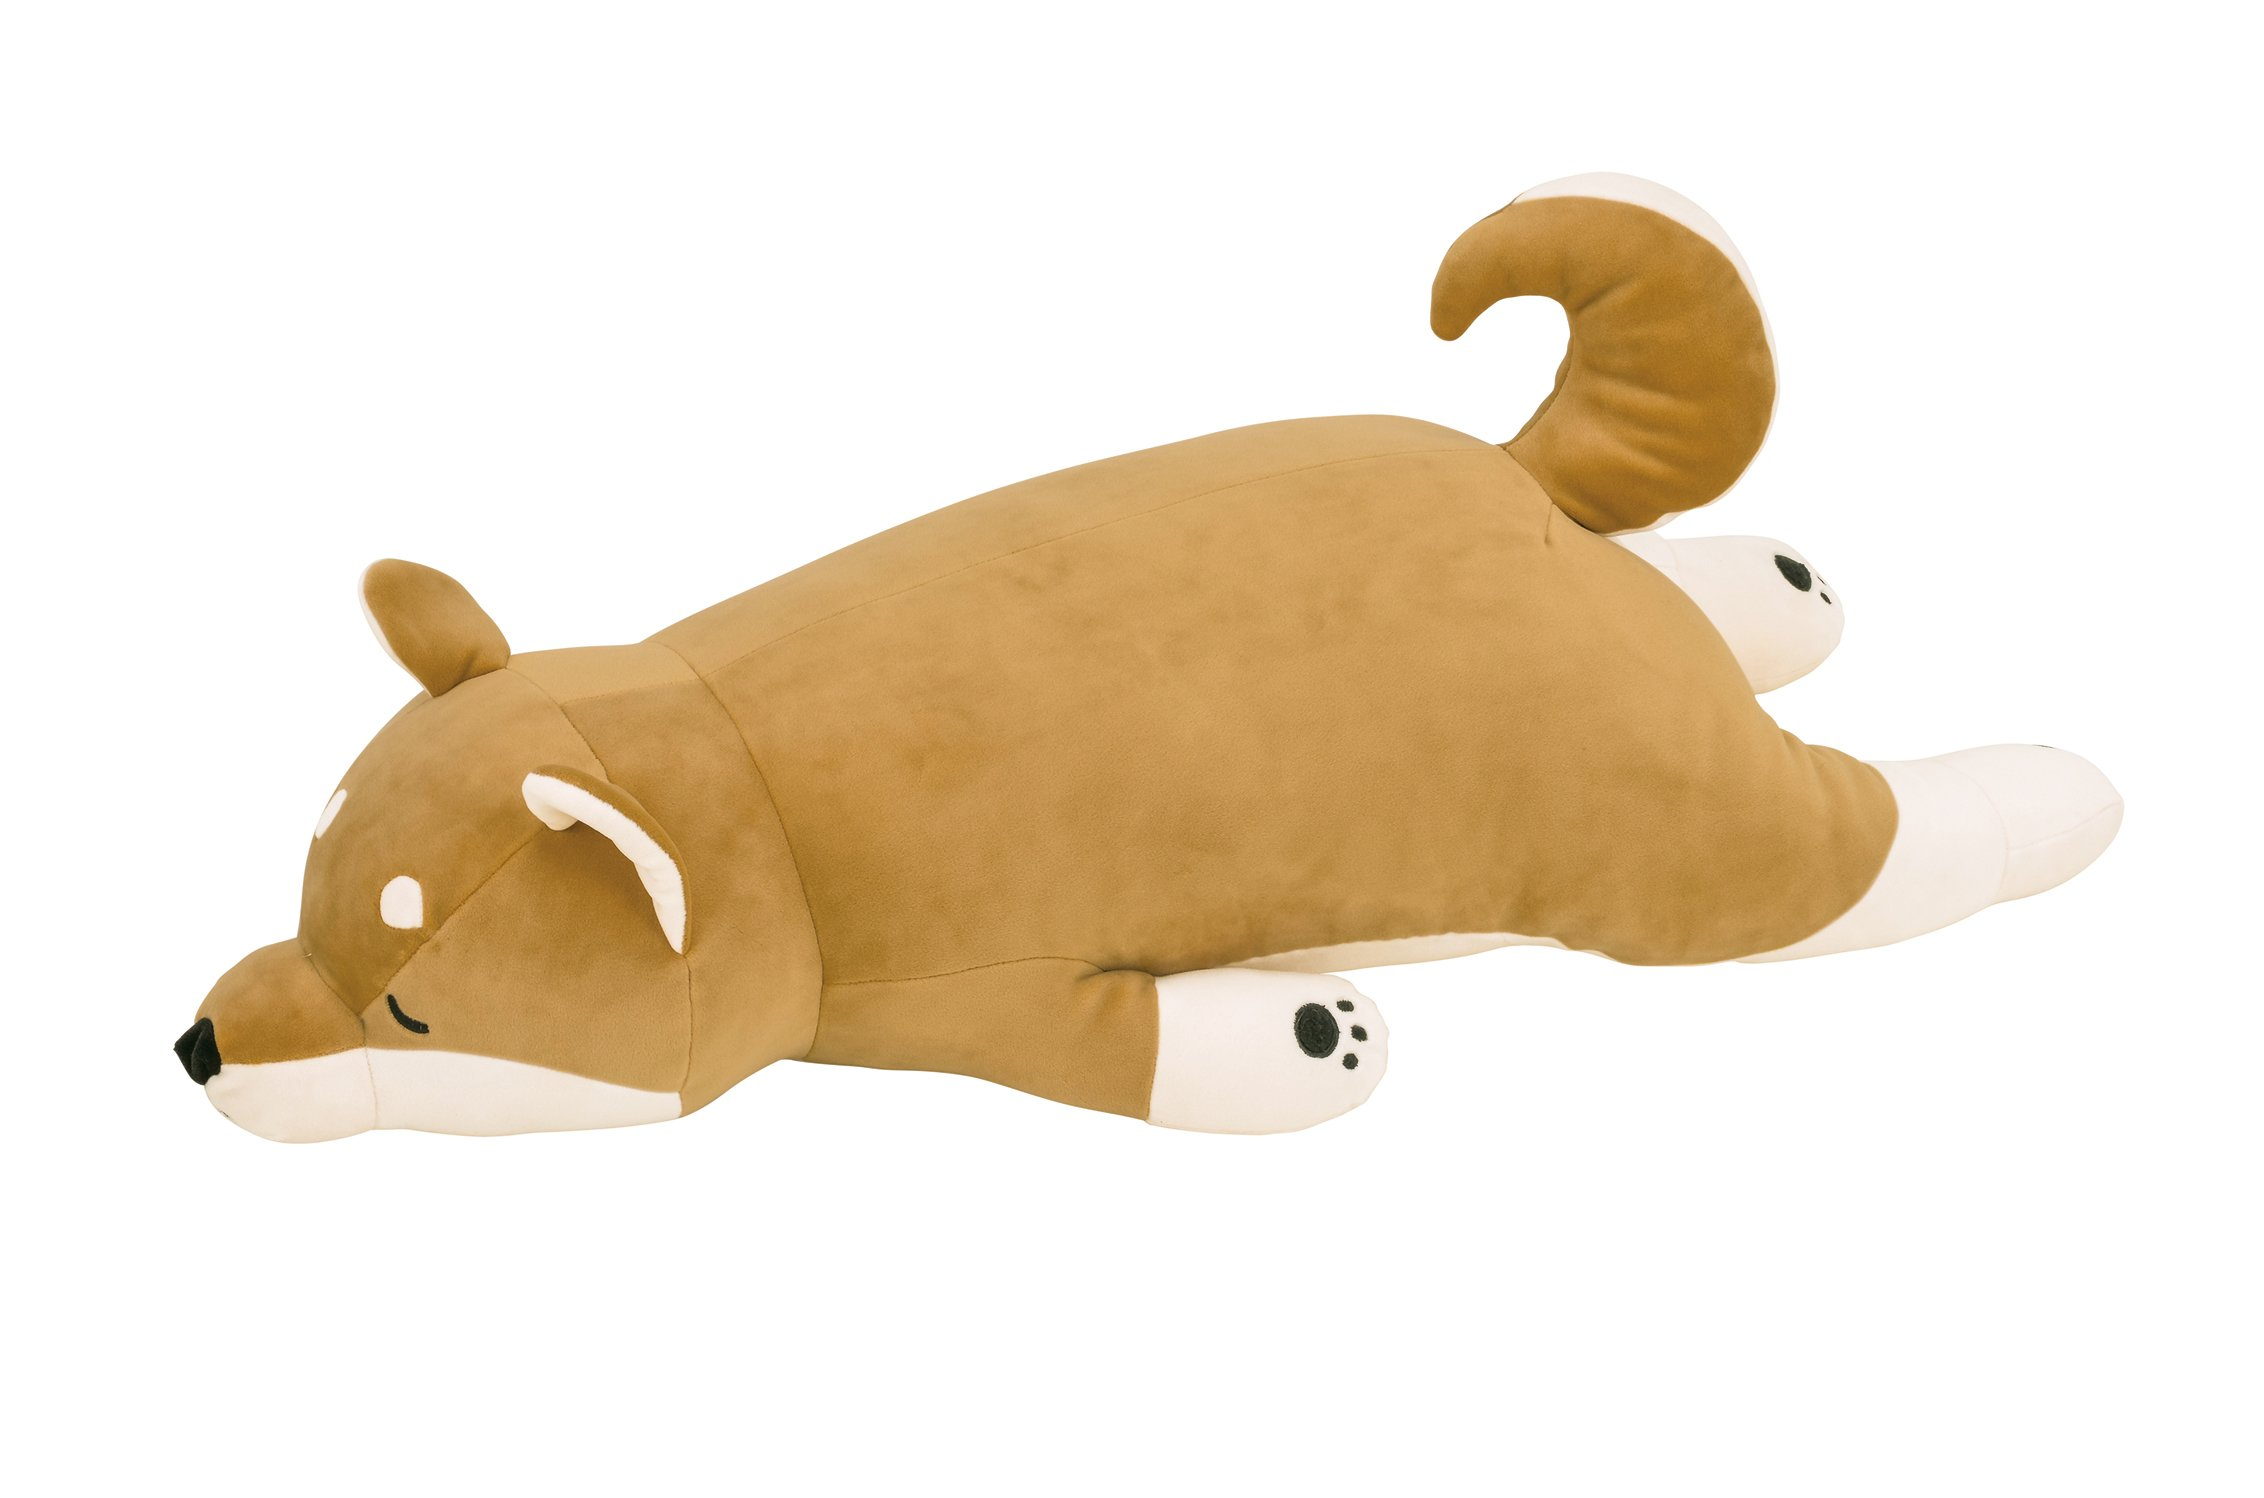 Ribu is after. Premium NEMU NEMU animals Dakimakura pillow Dakimakura pillow size L Shiba Inu apple pies (73 x 32 x 18 cm) 48768 - 44